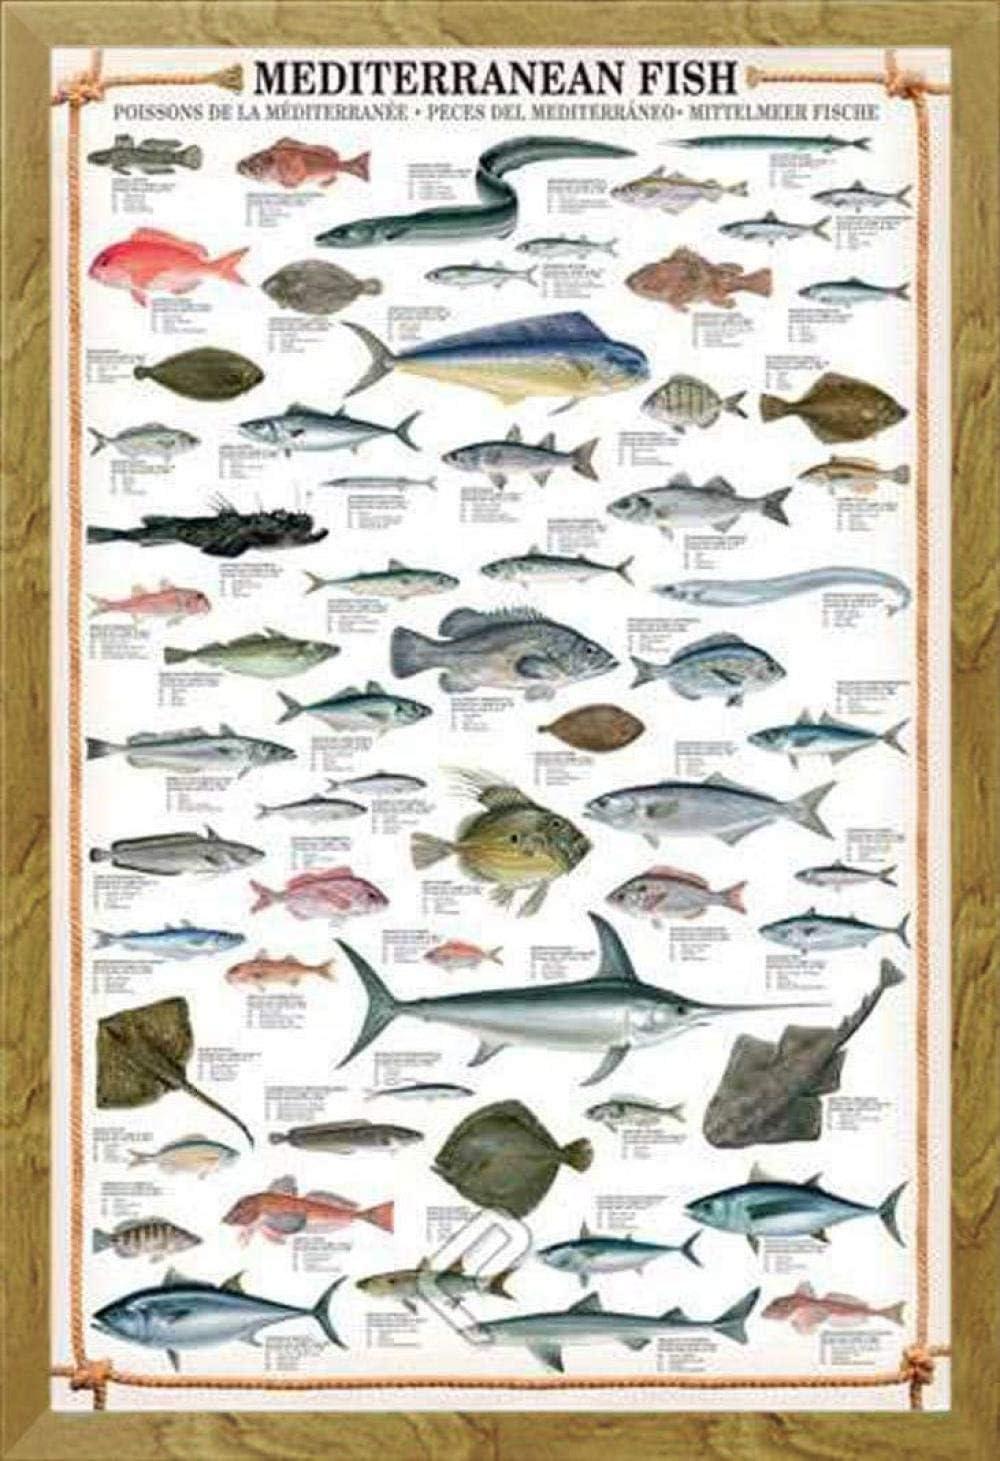 HAIBAOSMS póster Peces mediterráneos educativos Peces mediterráneos educación aprendizaje cartel impresión